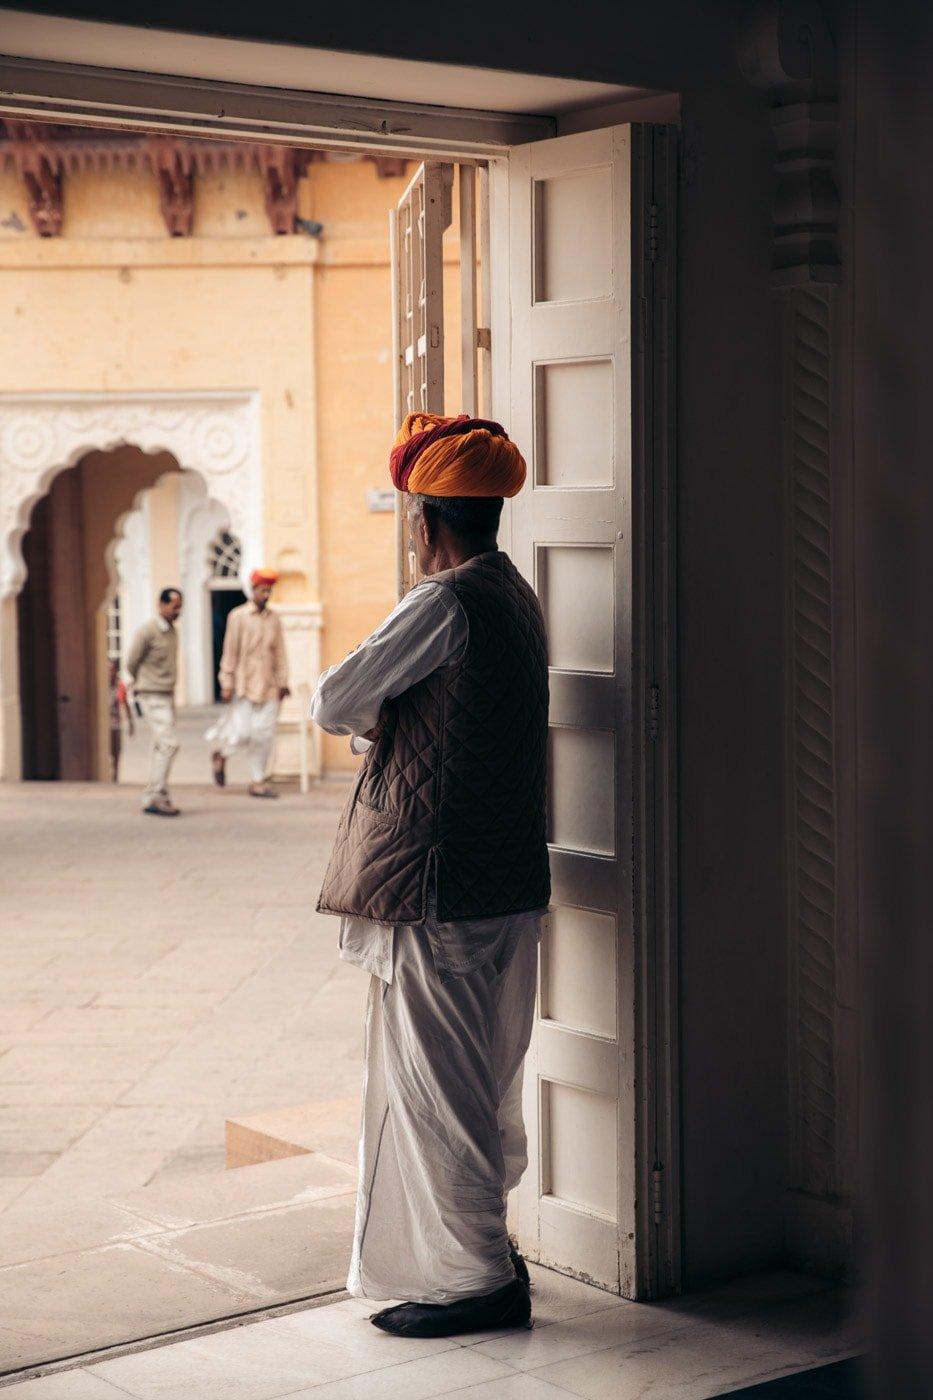 Guard in the Jodhpur Fort, India